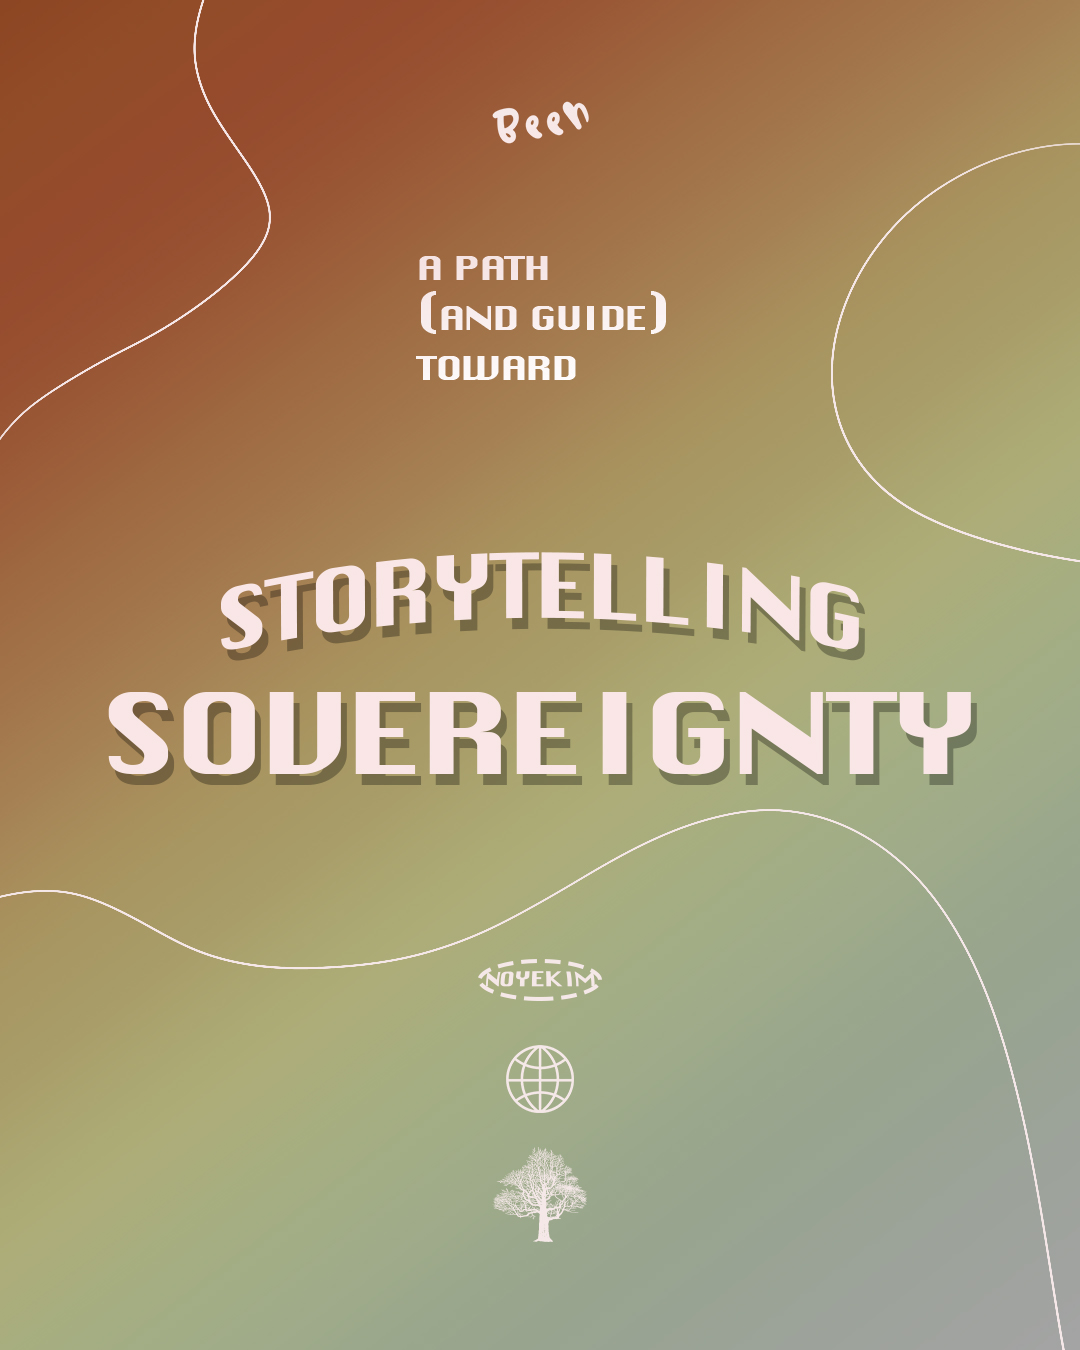 storytelling-sovereignty-BEEN-Media-_-Michael-A.-Estrada